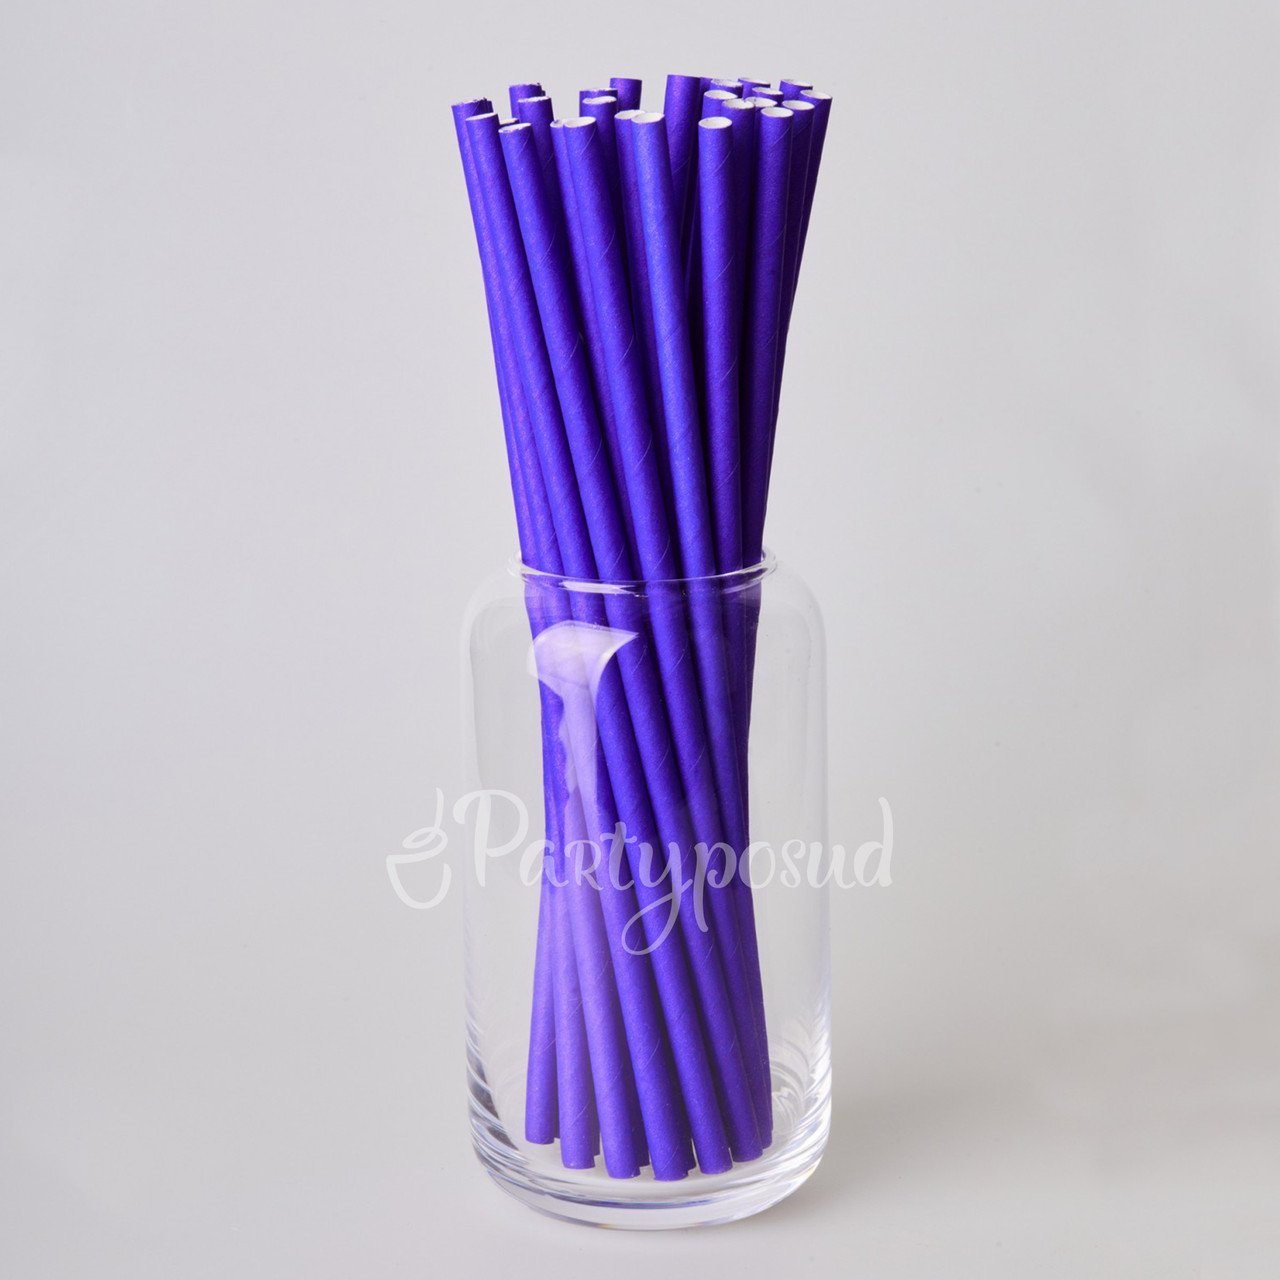 Трубочка бумажная фиолетовая